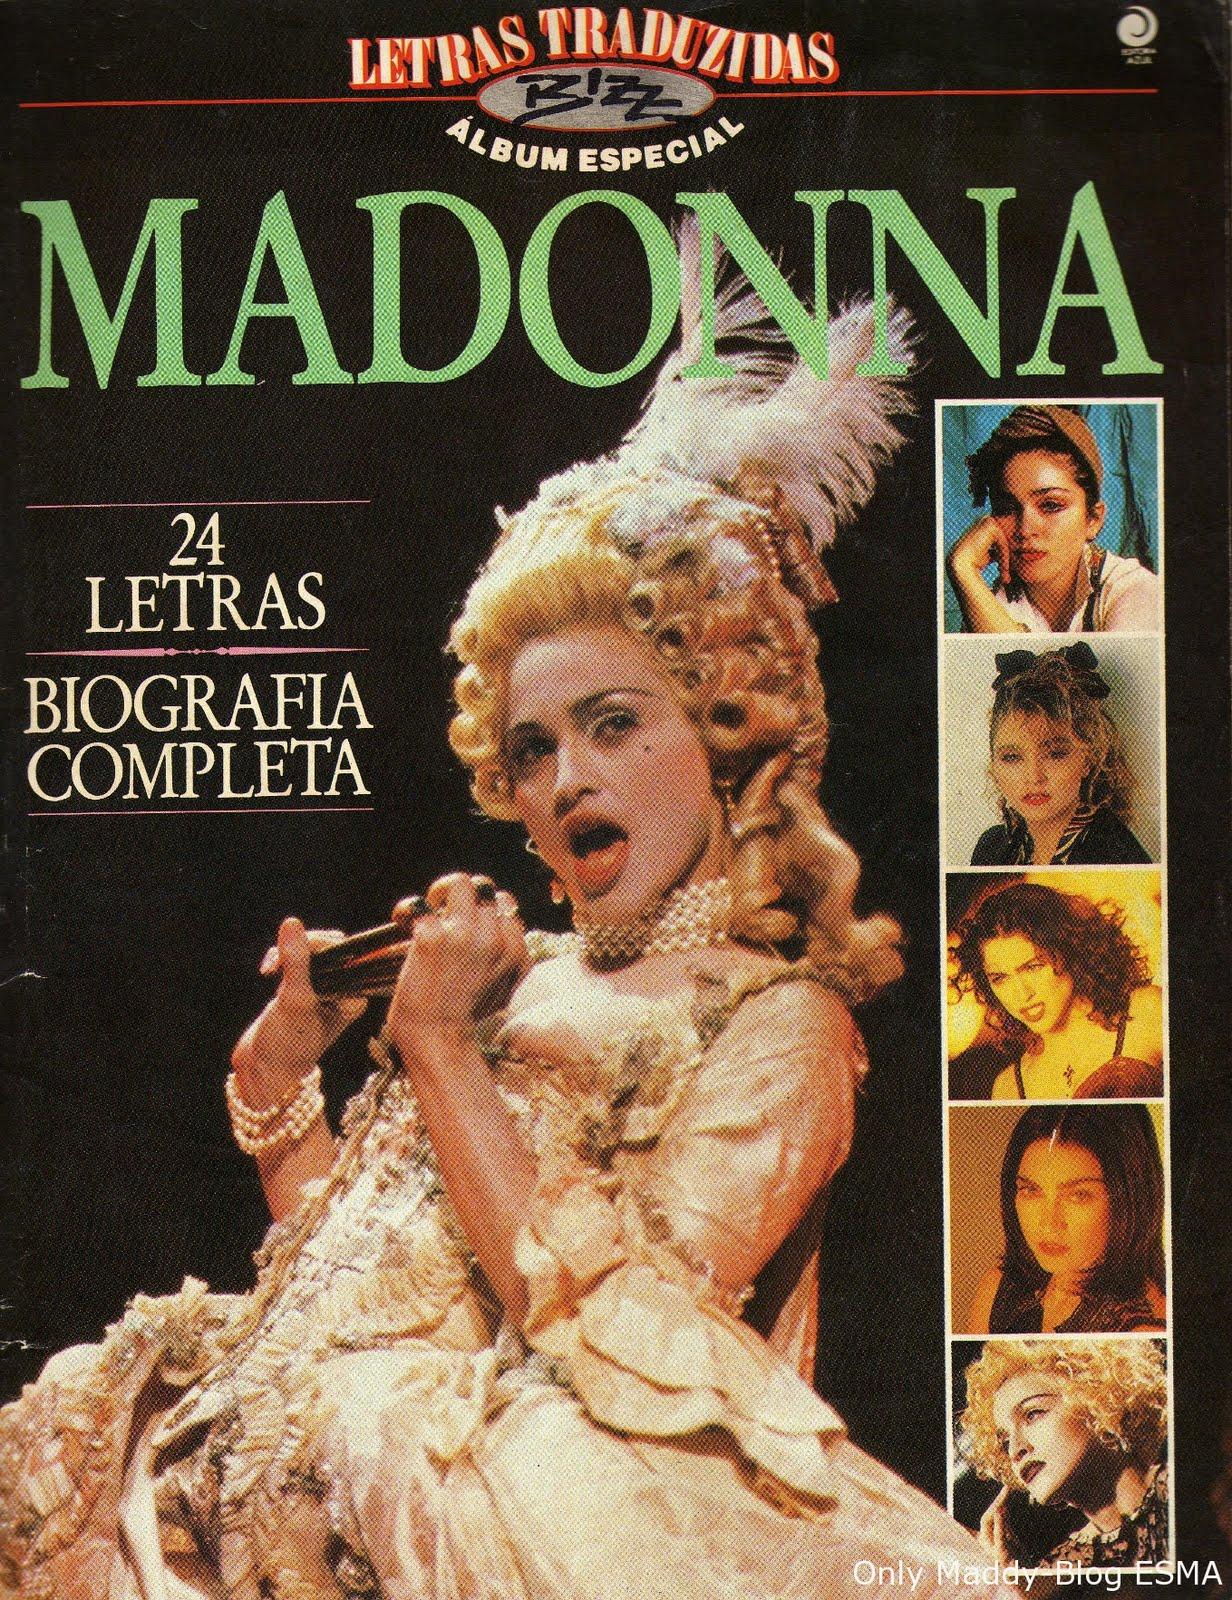 http://4.bp.blogspot.com/-FUp0HheqGWg/TdqdJnoQLmI/AAAAAAAAC94/43QxLE8lruE/s1600/revista_Bizz_1990_Madonna.jpg